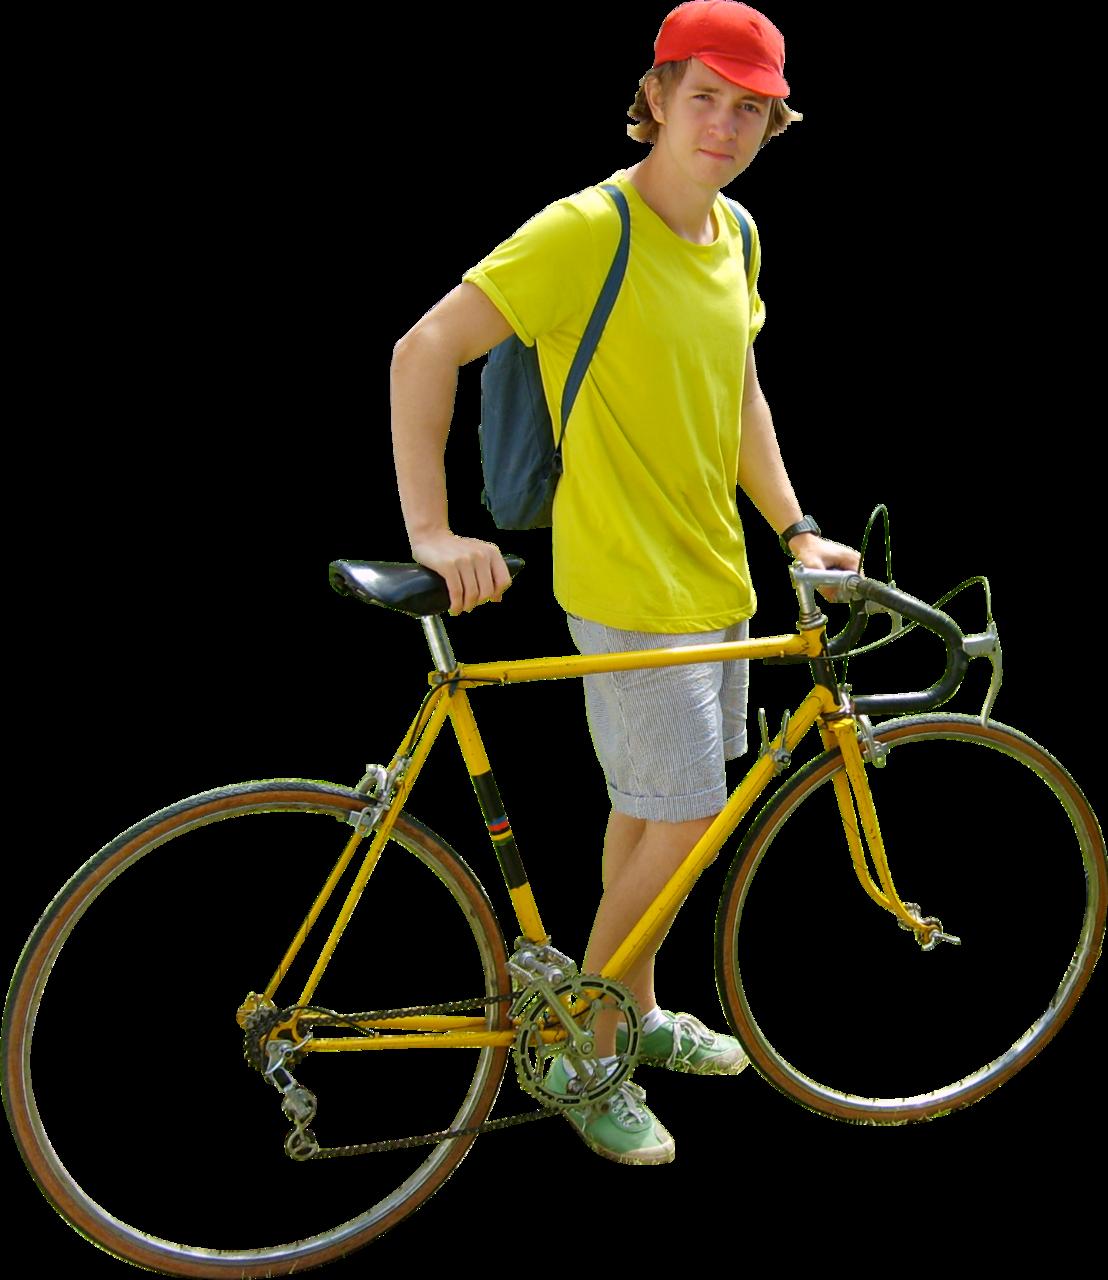 Trek bicycle corporation cranks. Clipart bike yellow bike